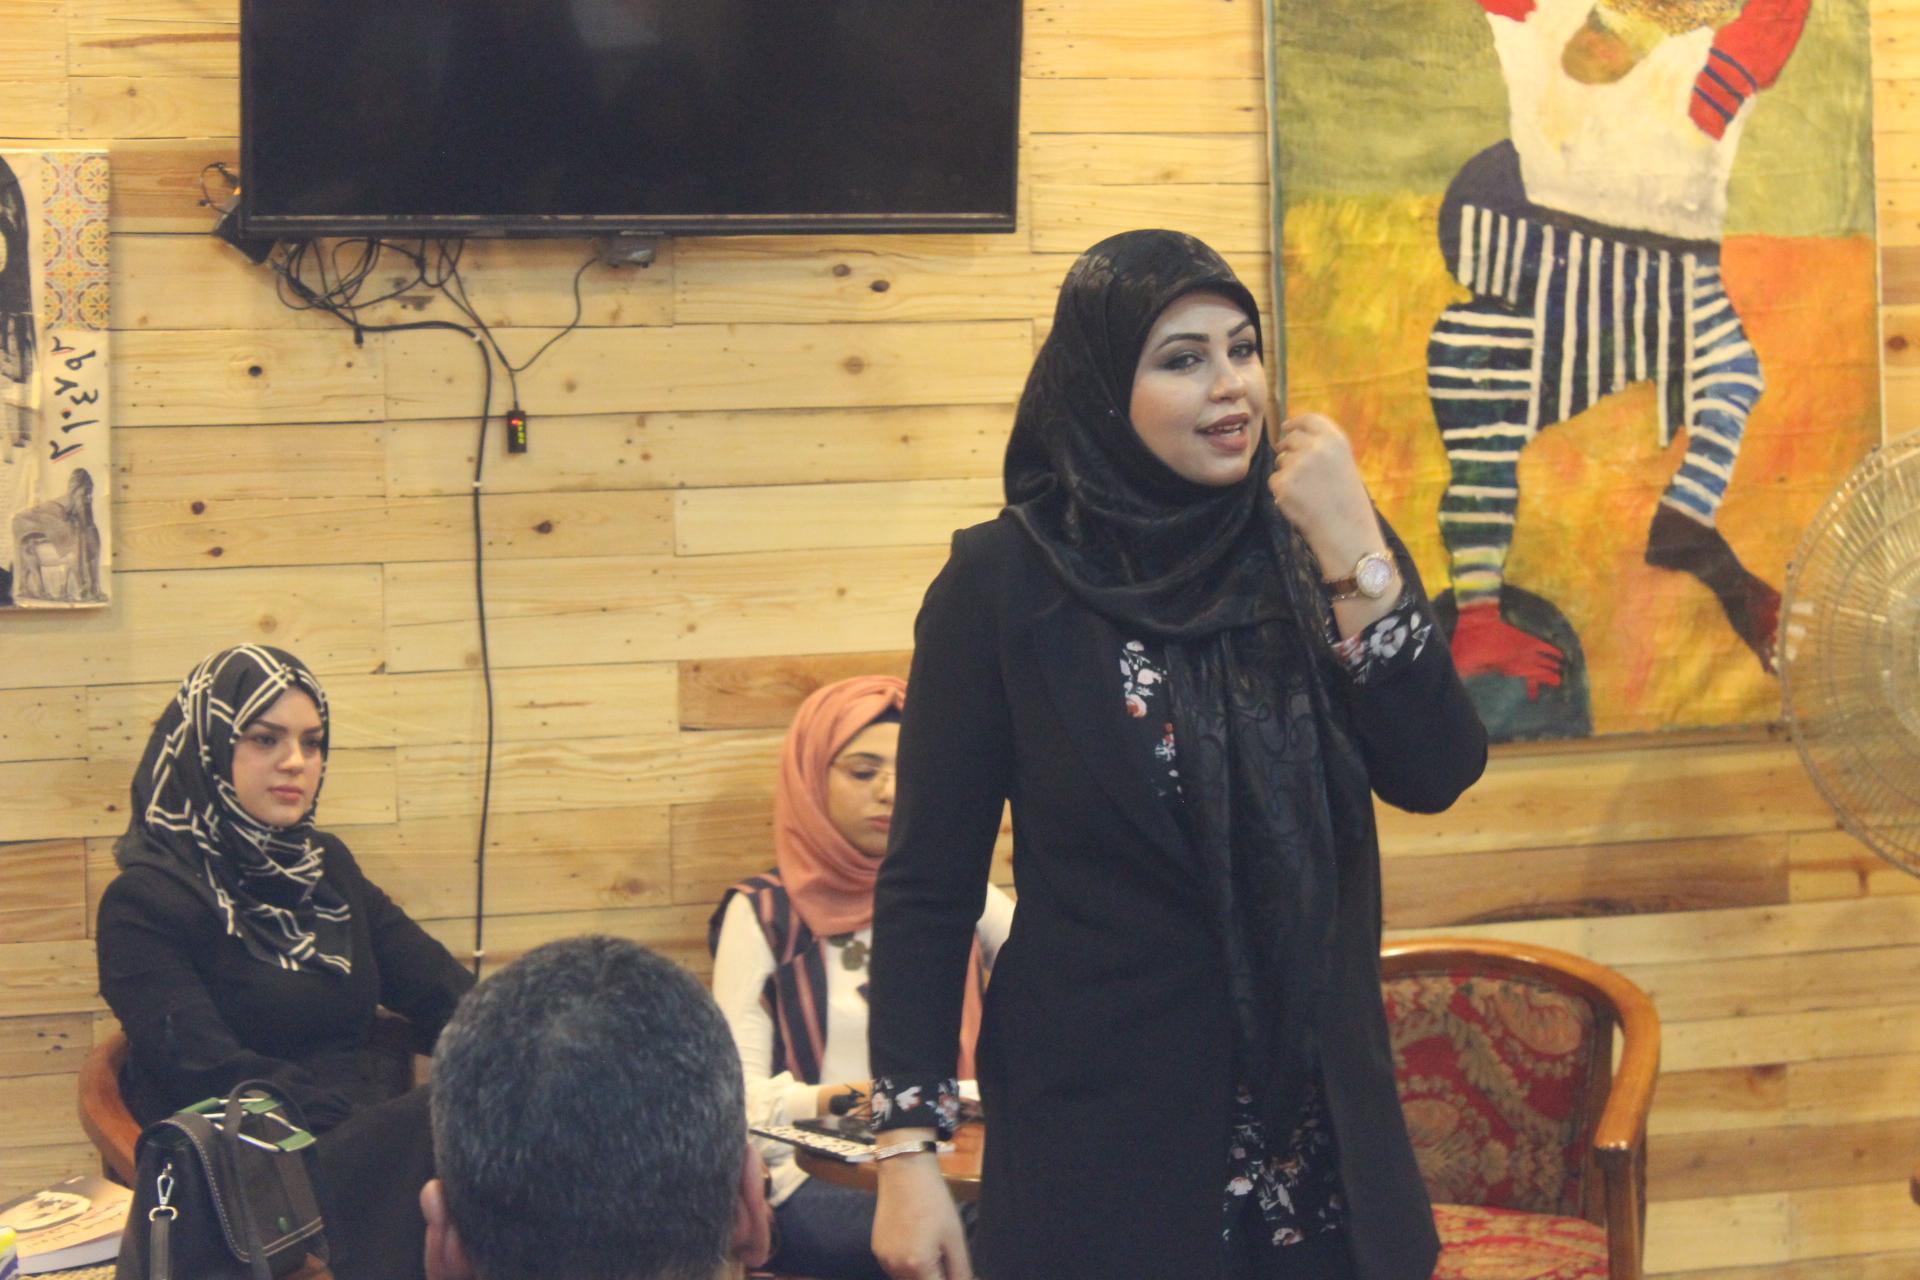 Businesswomen, between managing business and regular business projects.